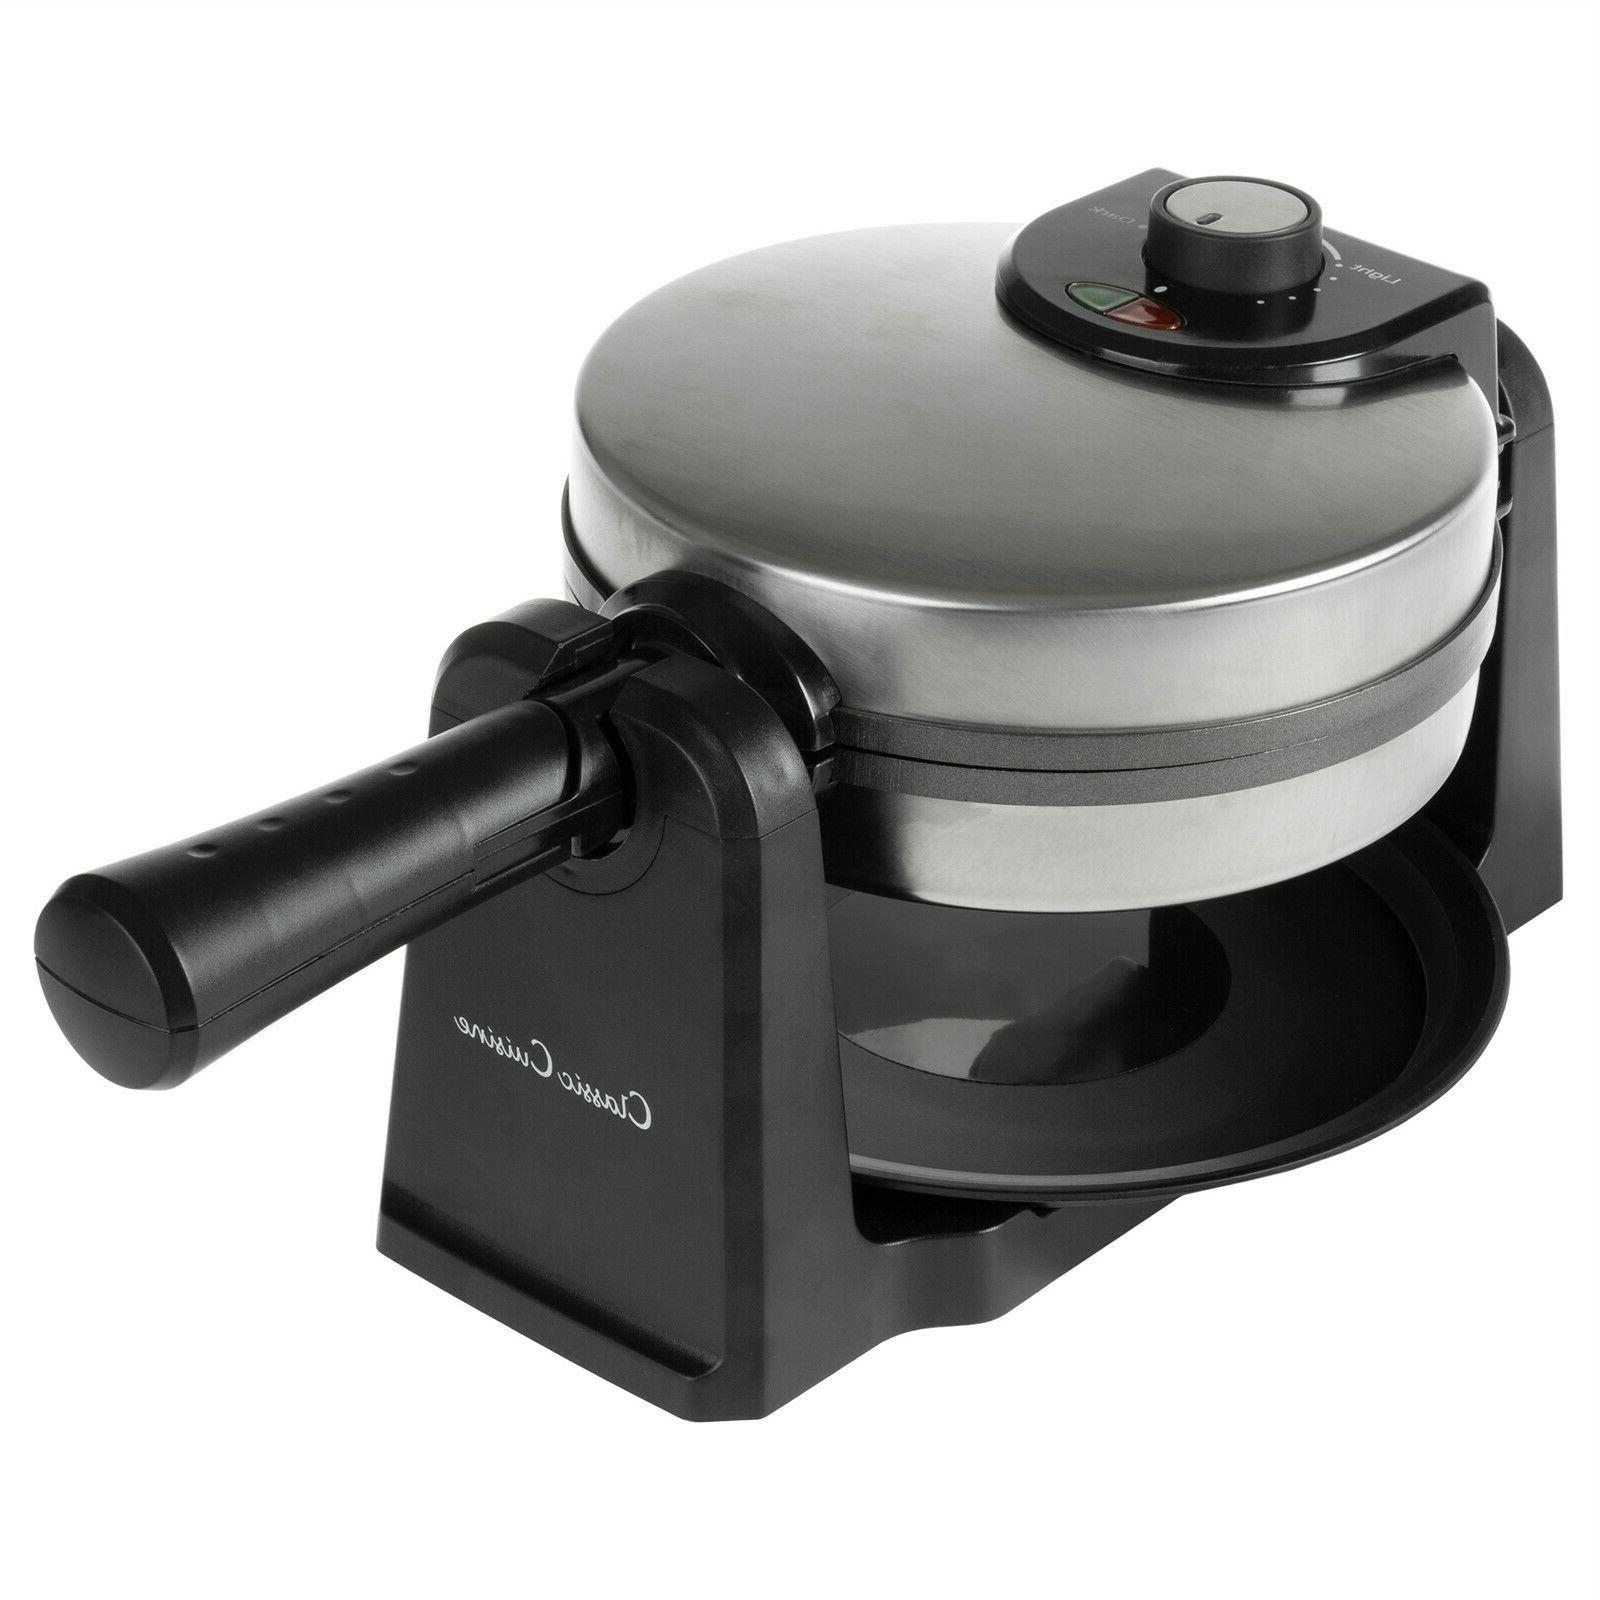 Electric Waffle Iron Nonstick 180 Flip Drip Pan Folding Easy